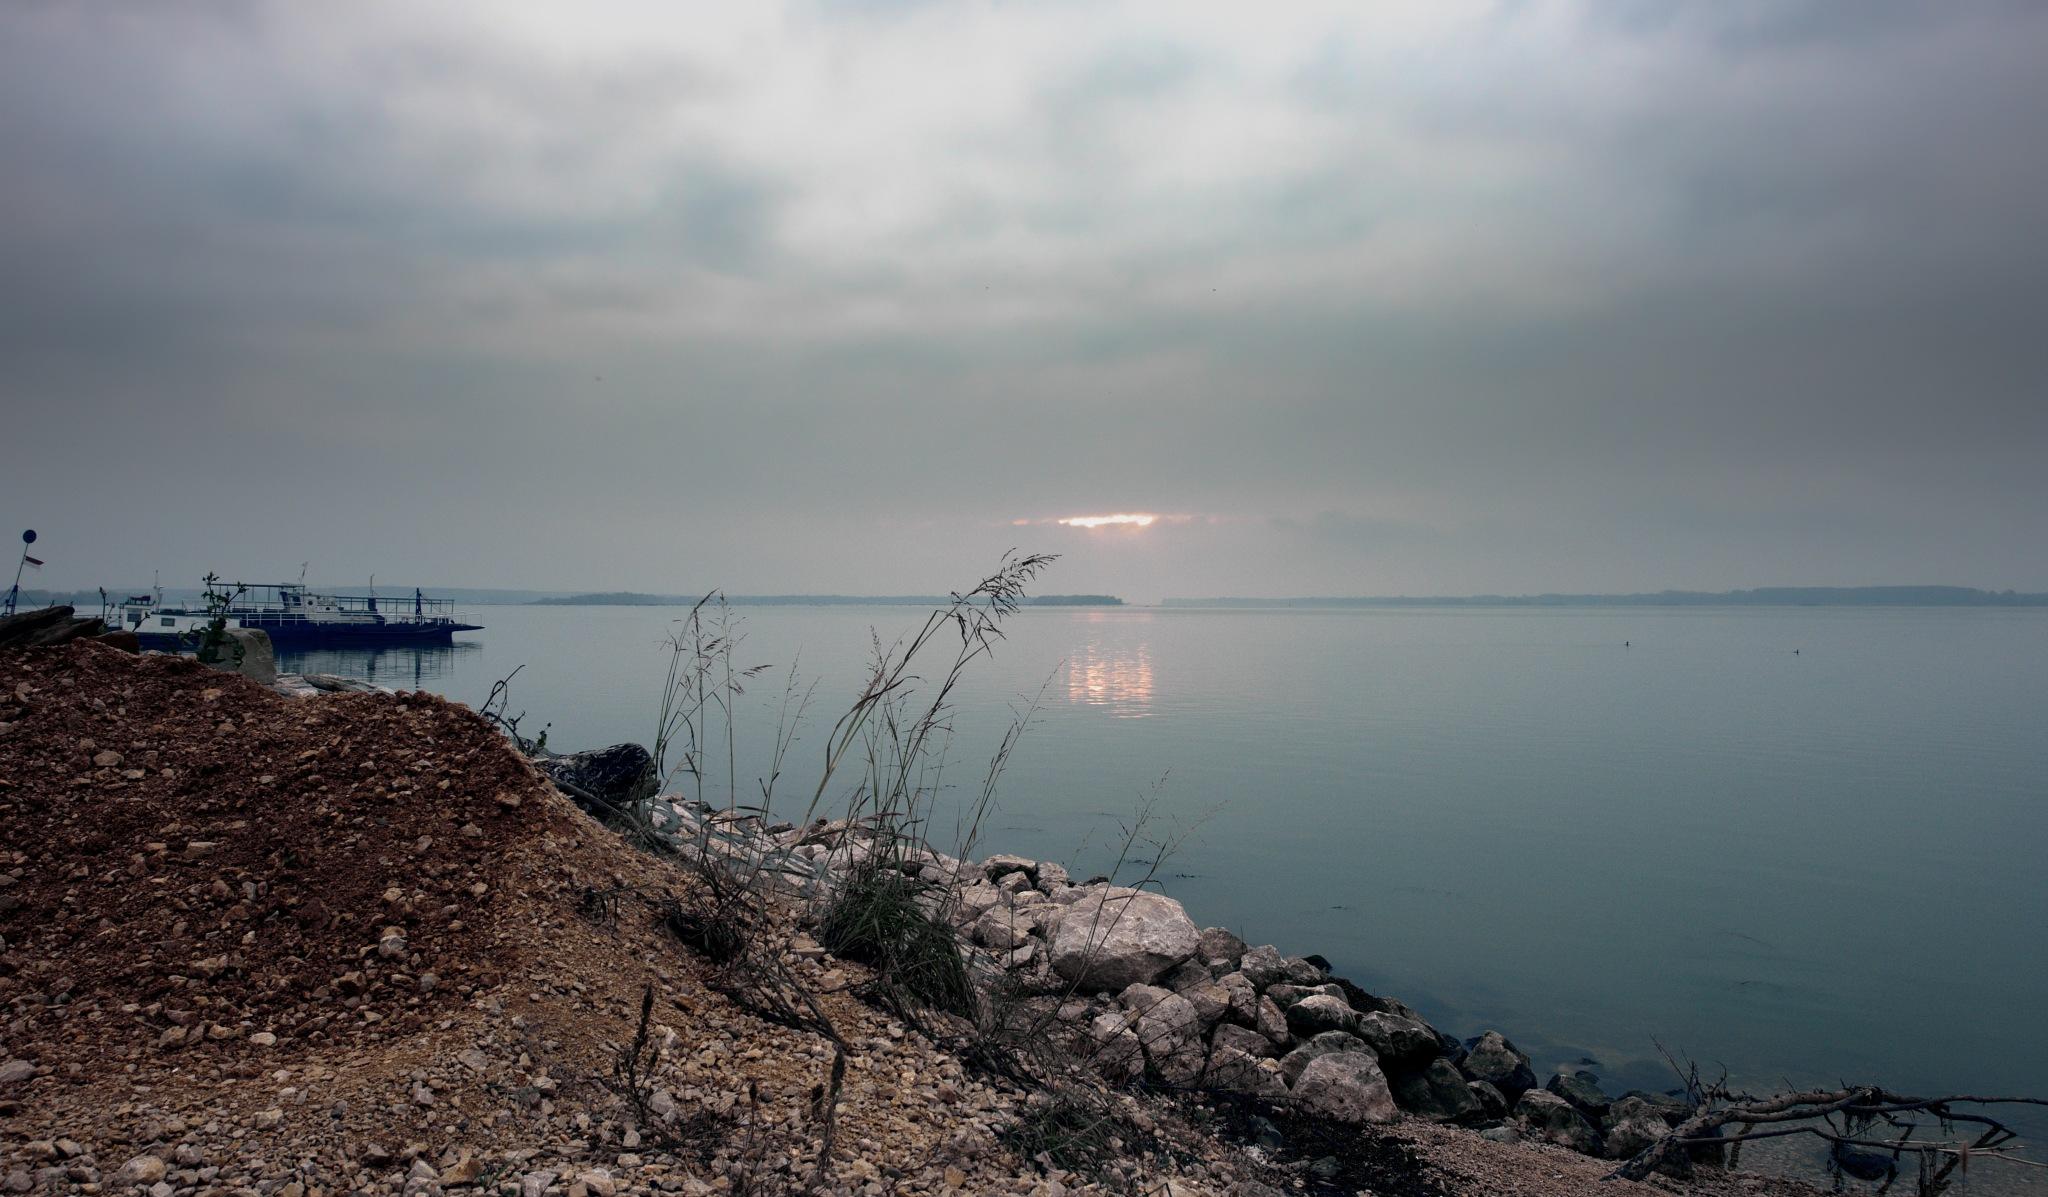 Sunset on the Danube by elena.biianu